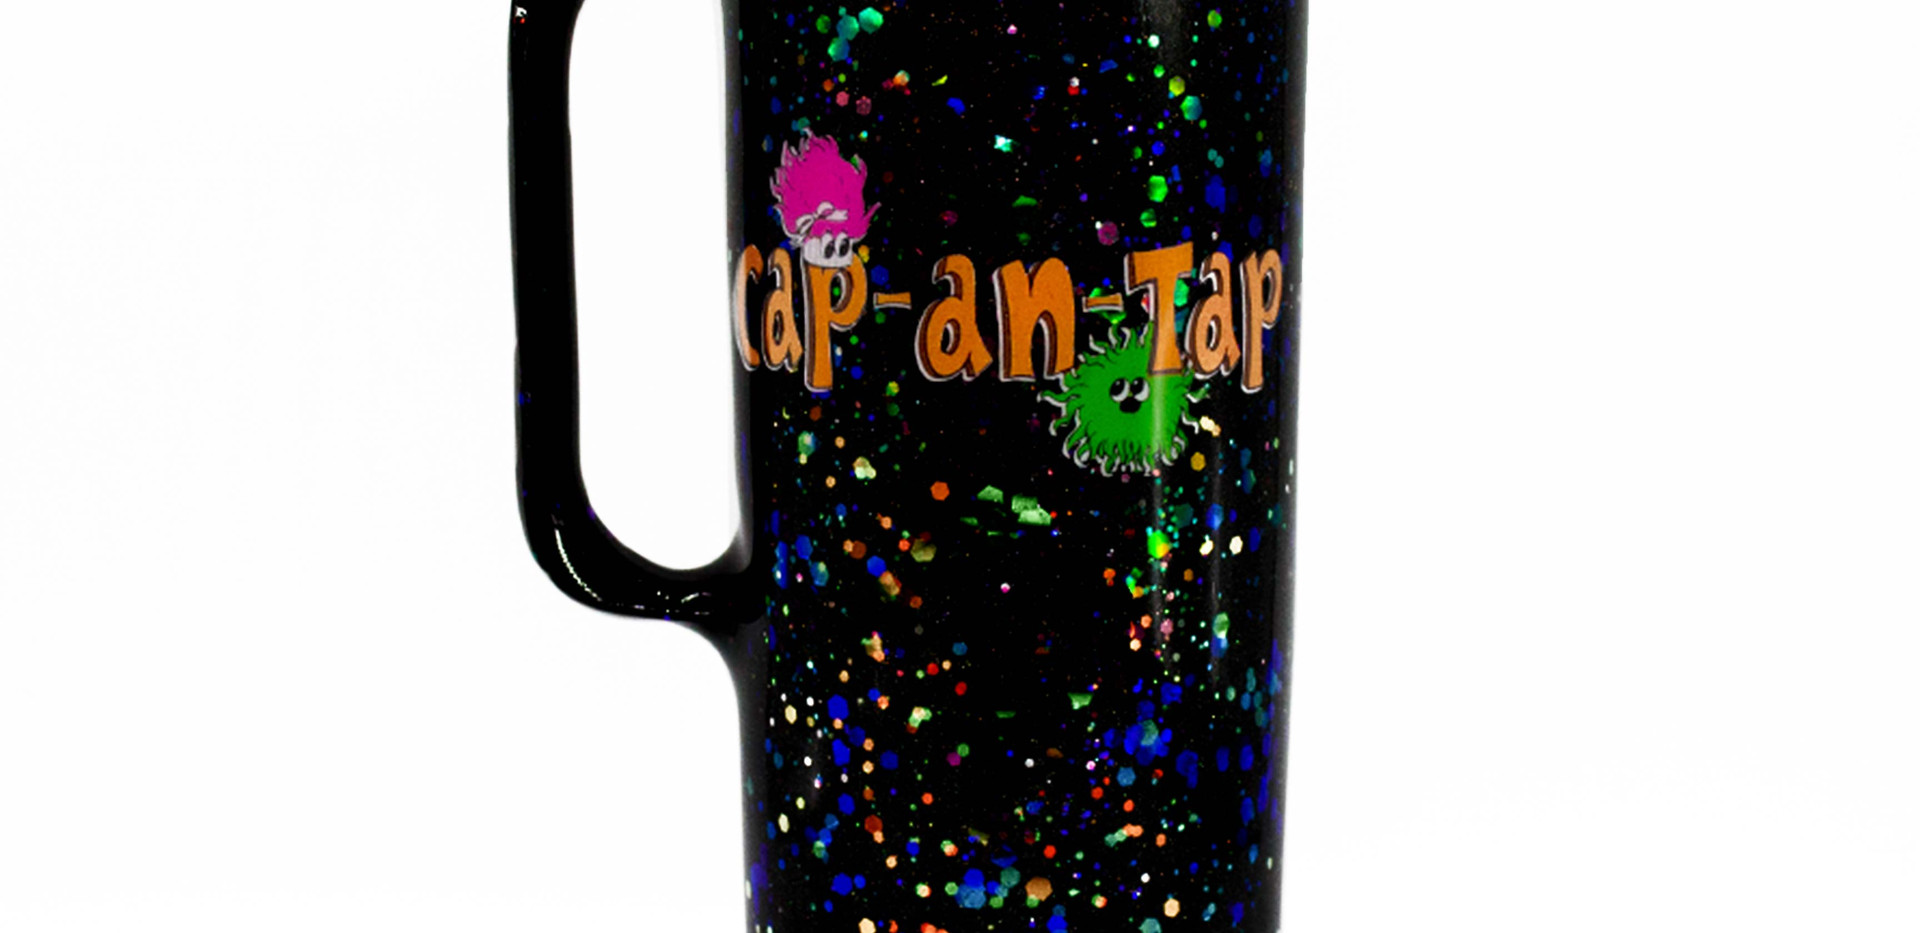 capantap sock product-6.jpg